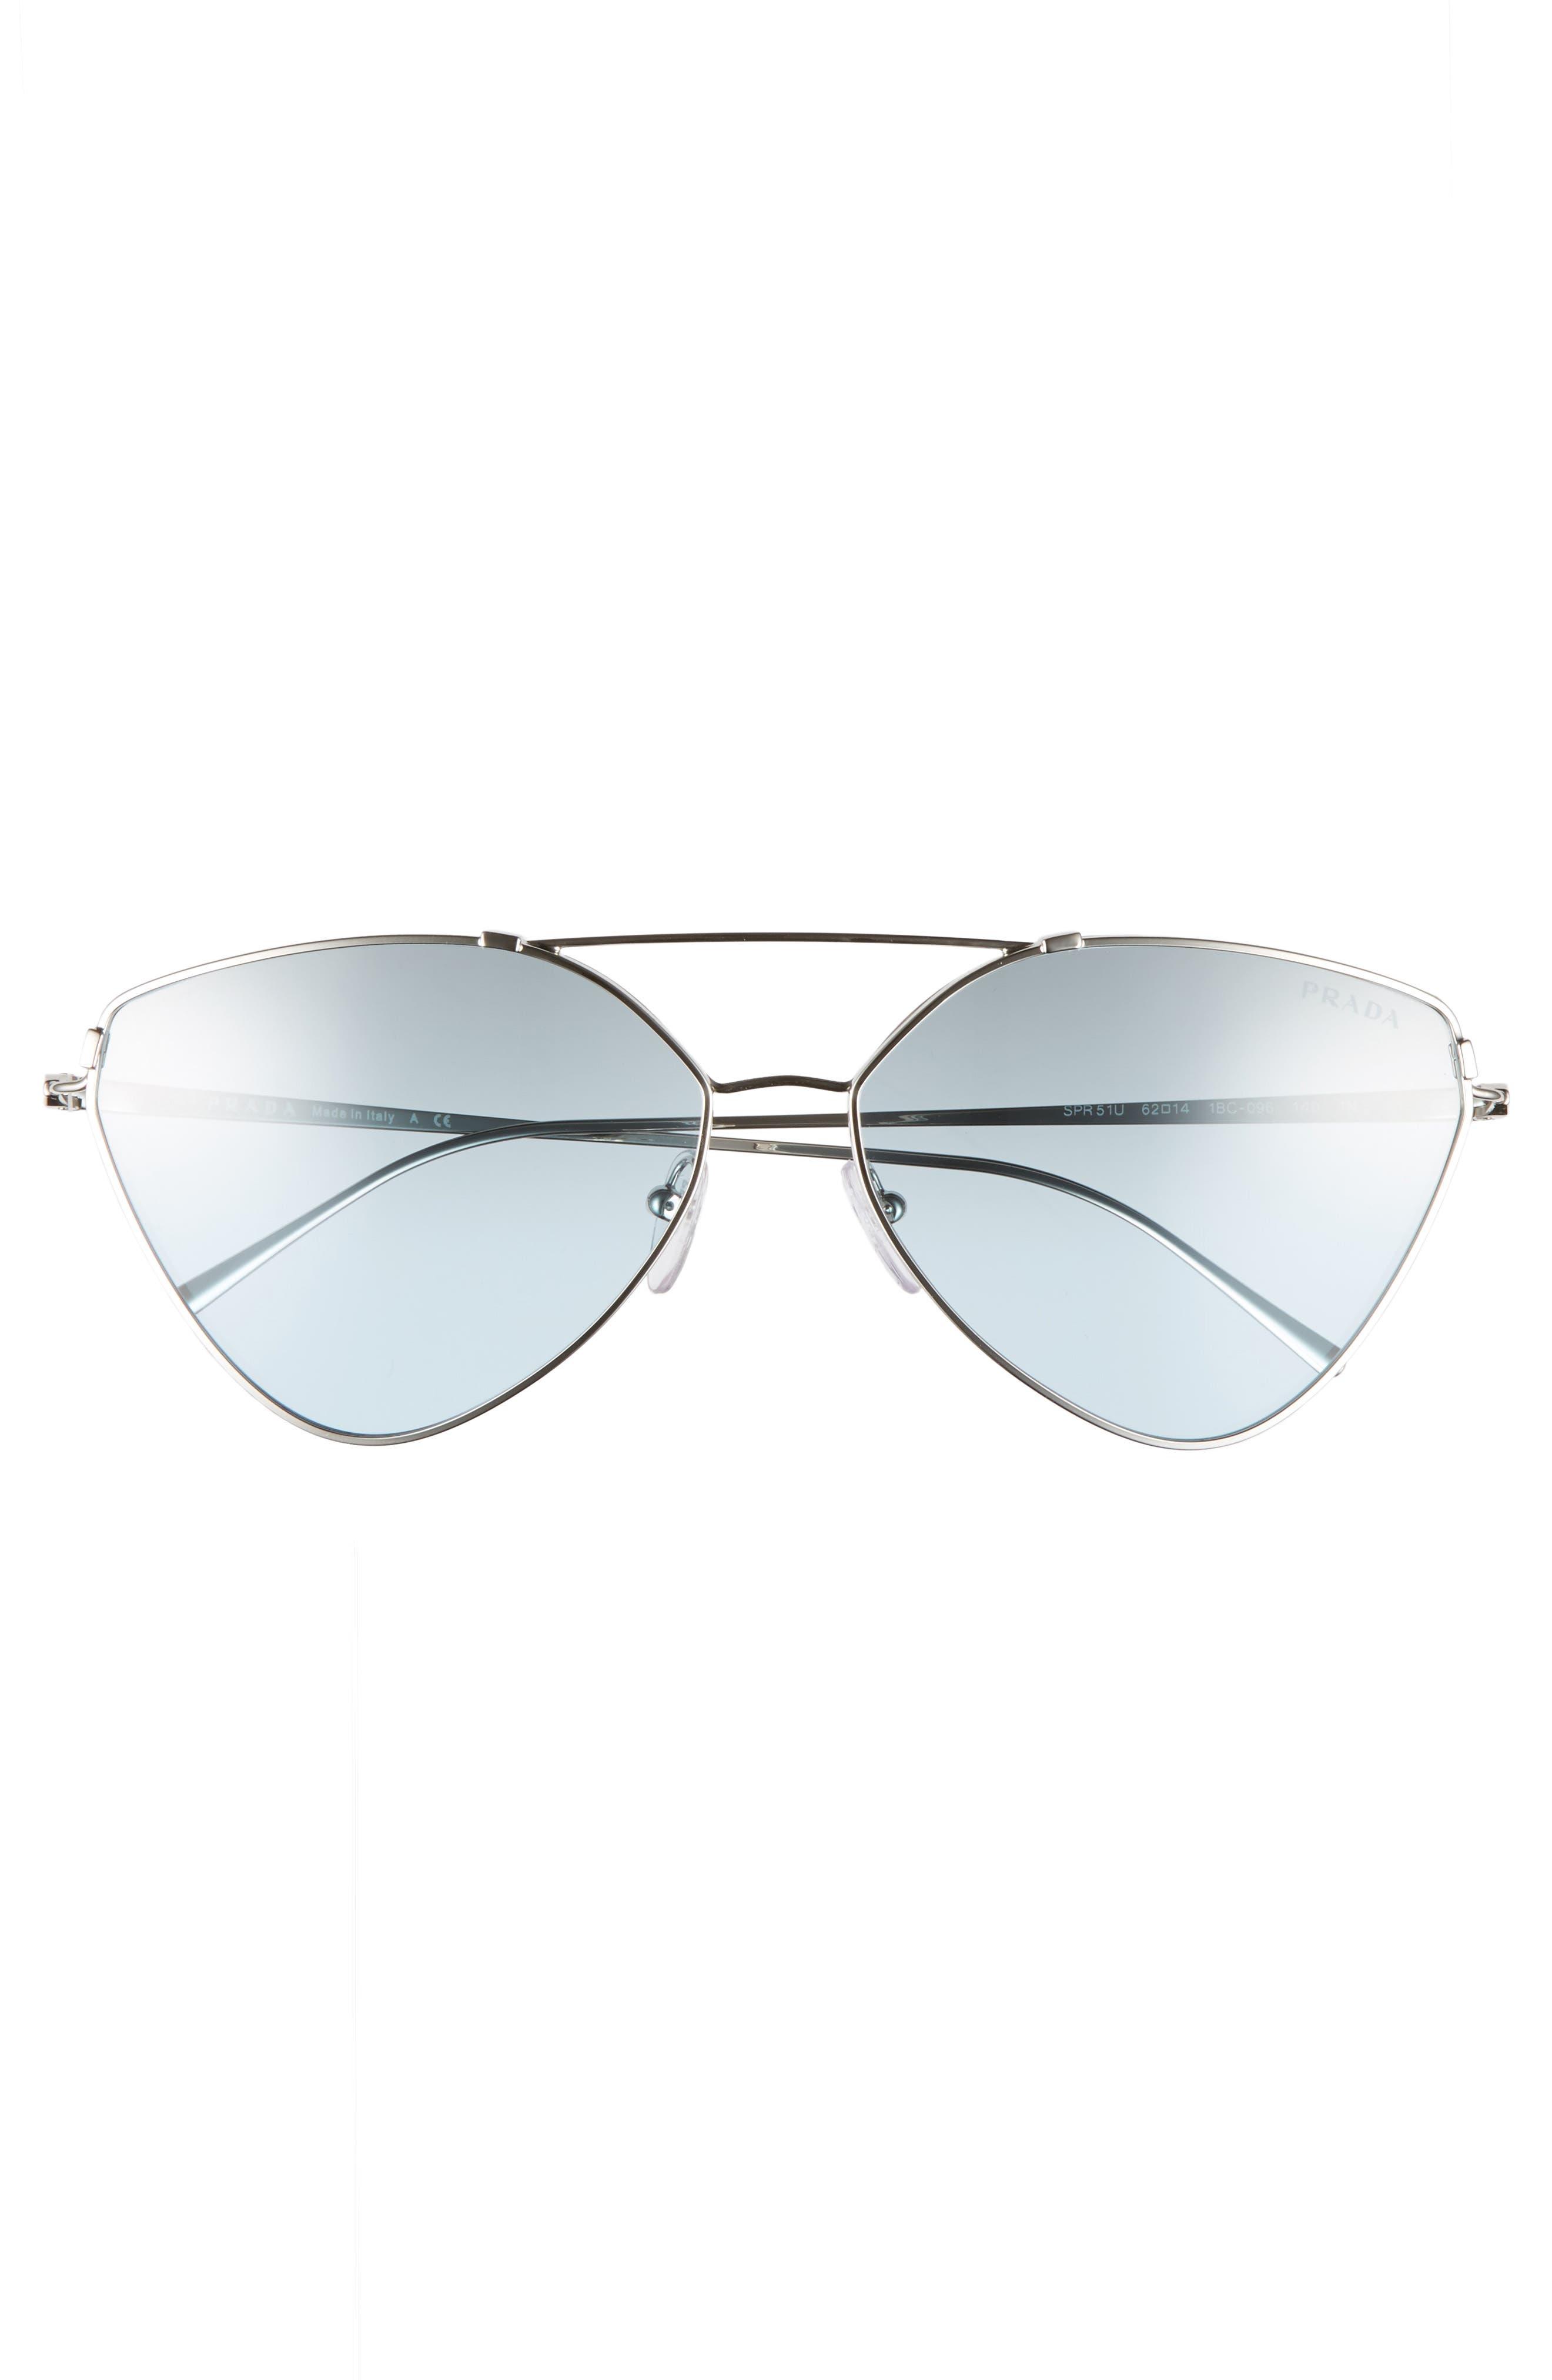 62mm Oversize Aviator Sunglasses,                             Alternate thumbnail 4, color,